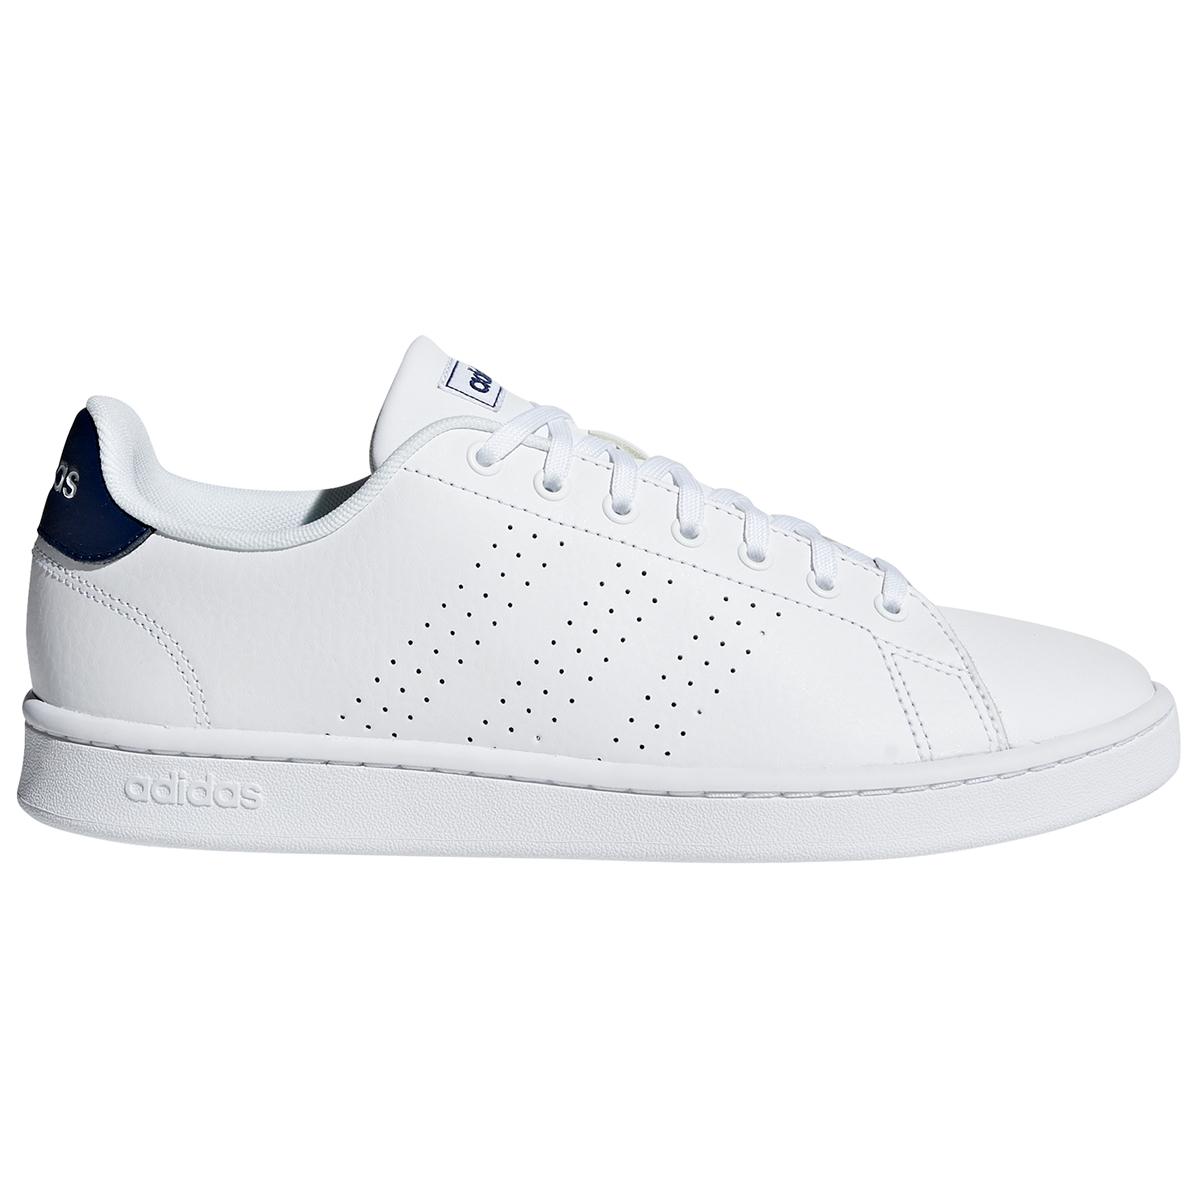 Adidas Men's Advantage Shoes - White, 10